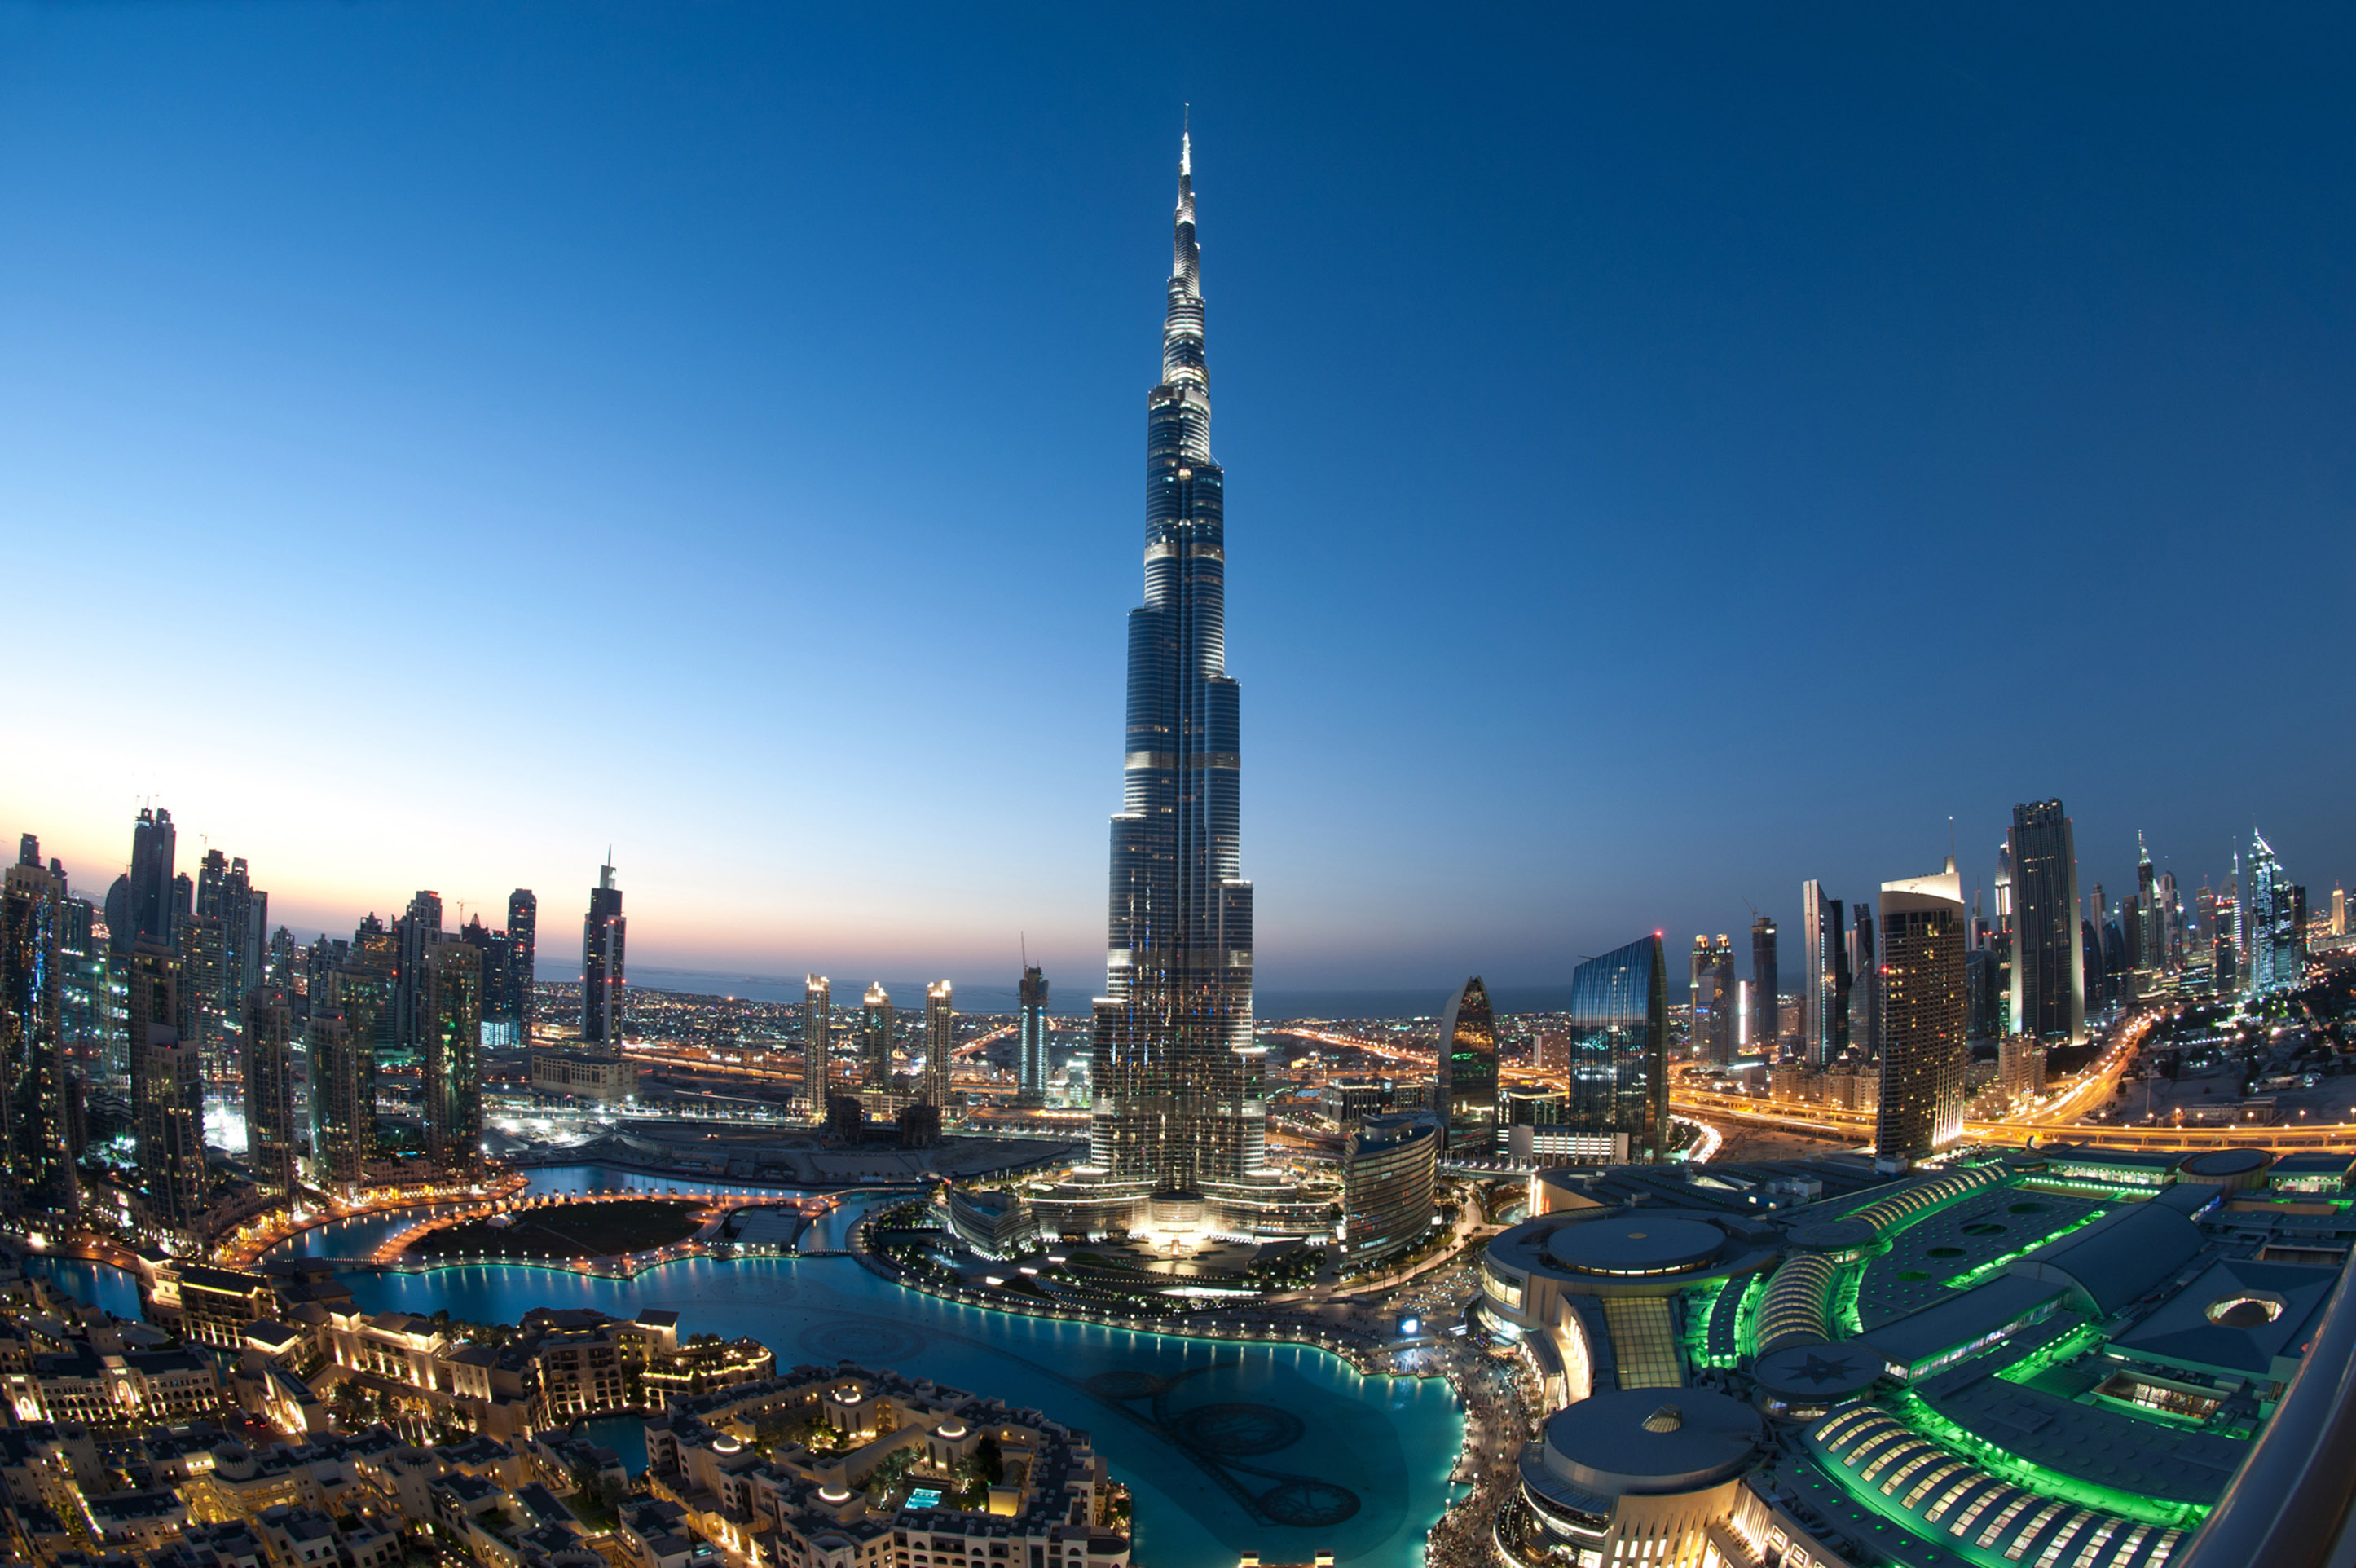 Дубай сегодня фото средняя цена квартиры в дубае